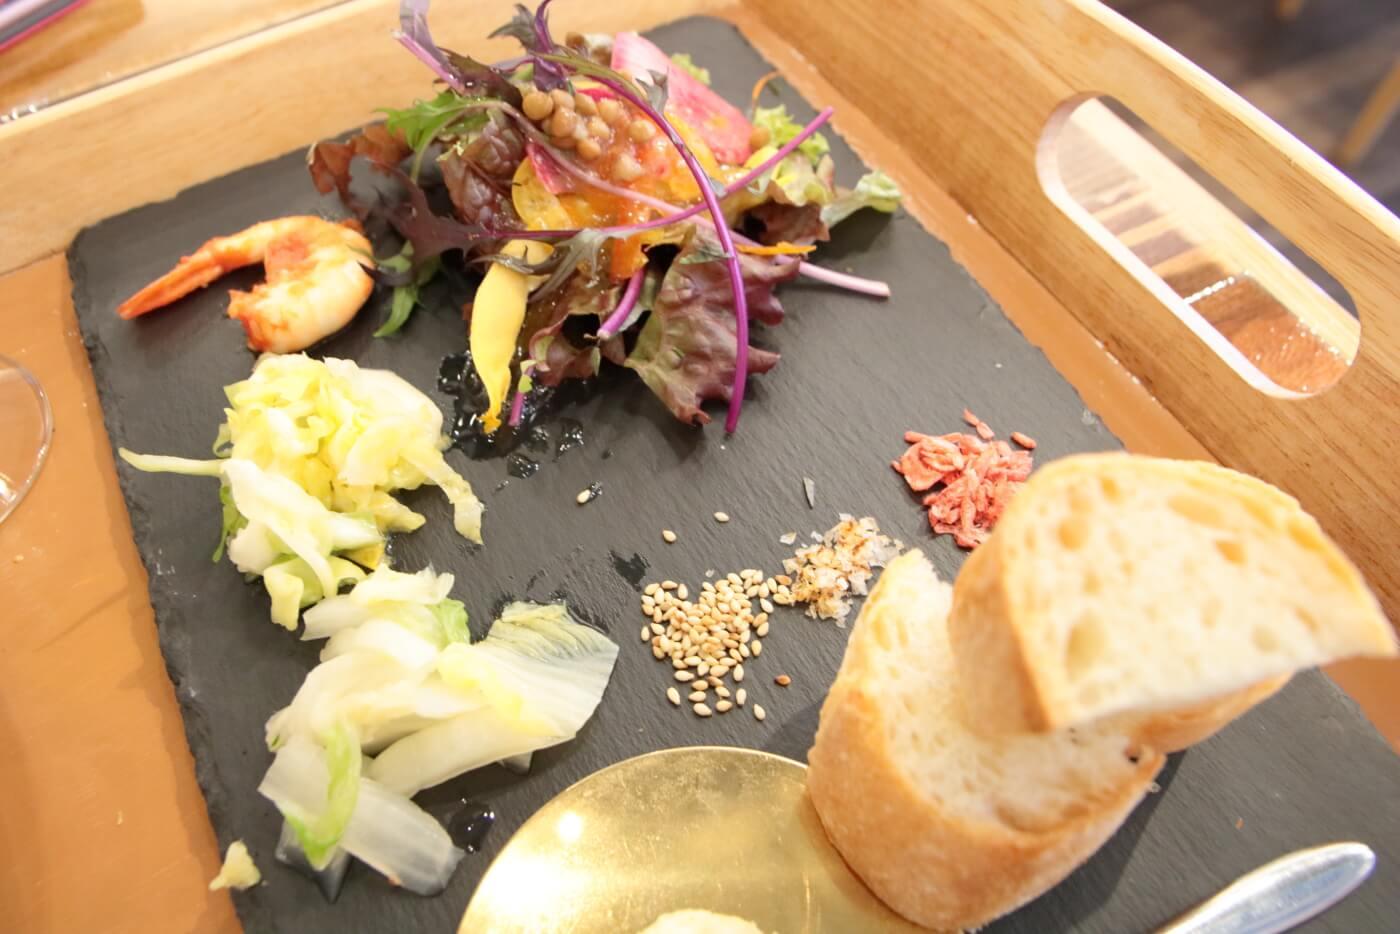 PIzzeriaORTO オルト ランチの前菜とサラダとフランスパンのトースト